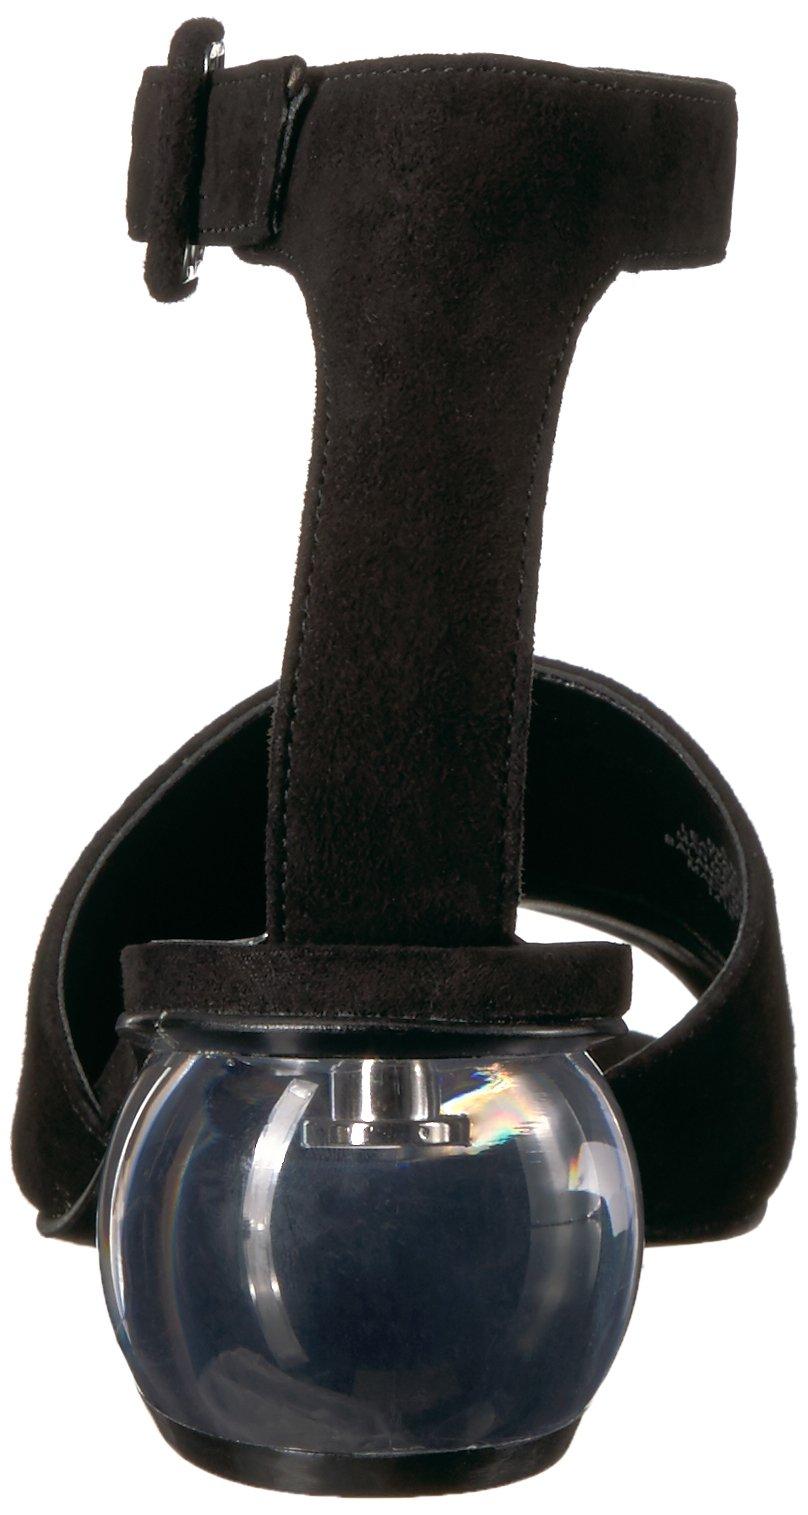 Nine West Women's Enyo Suede Heeled Sandal, Black Suede, 6.5 M US by Nine West (Image #2)